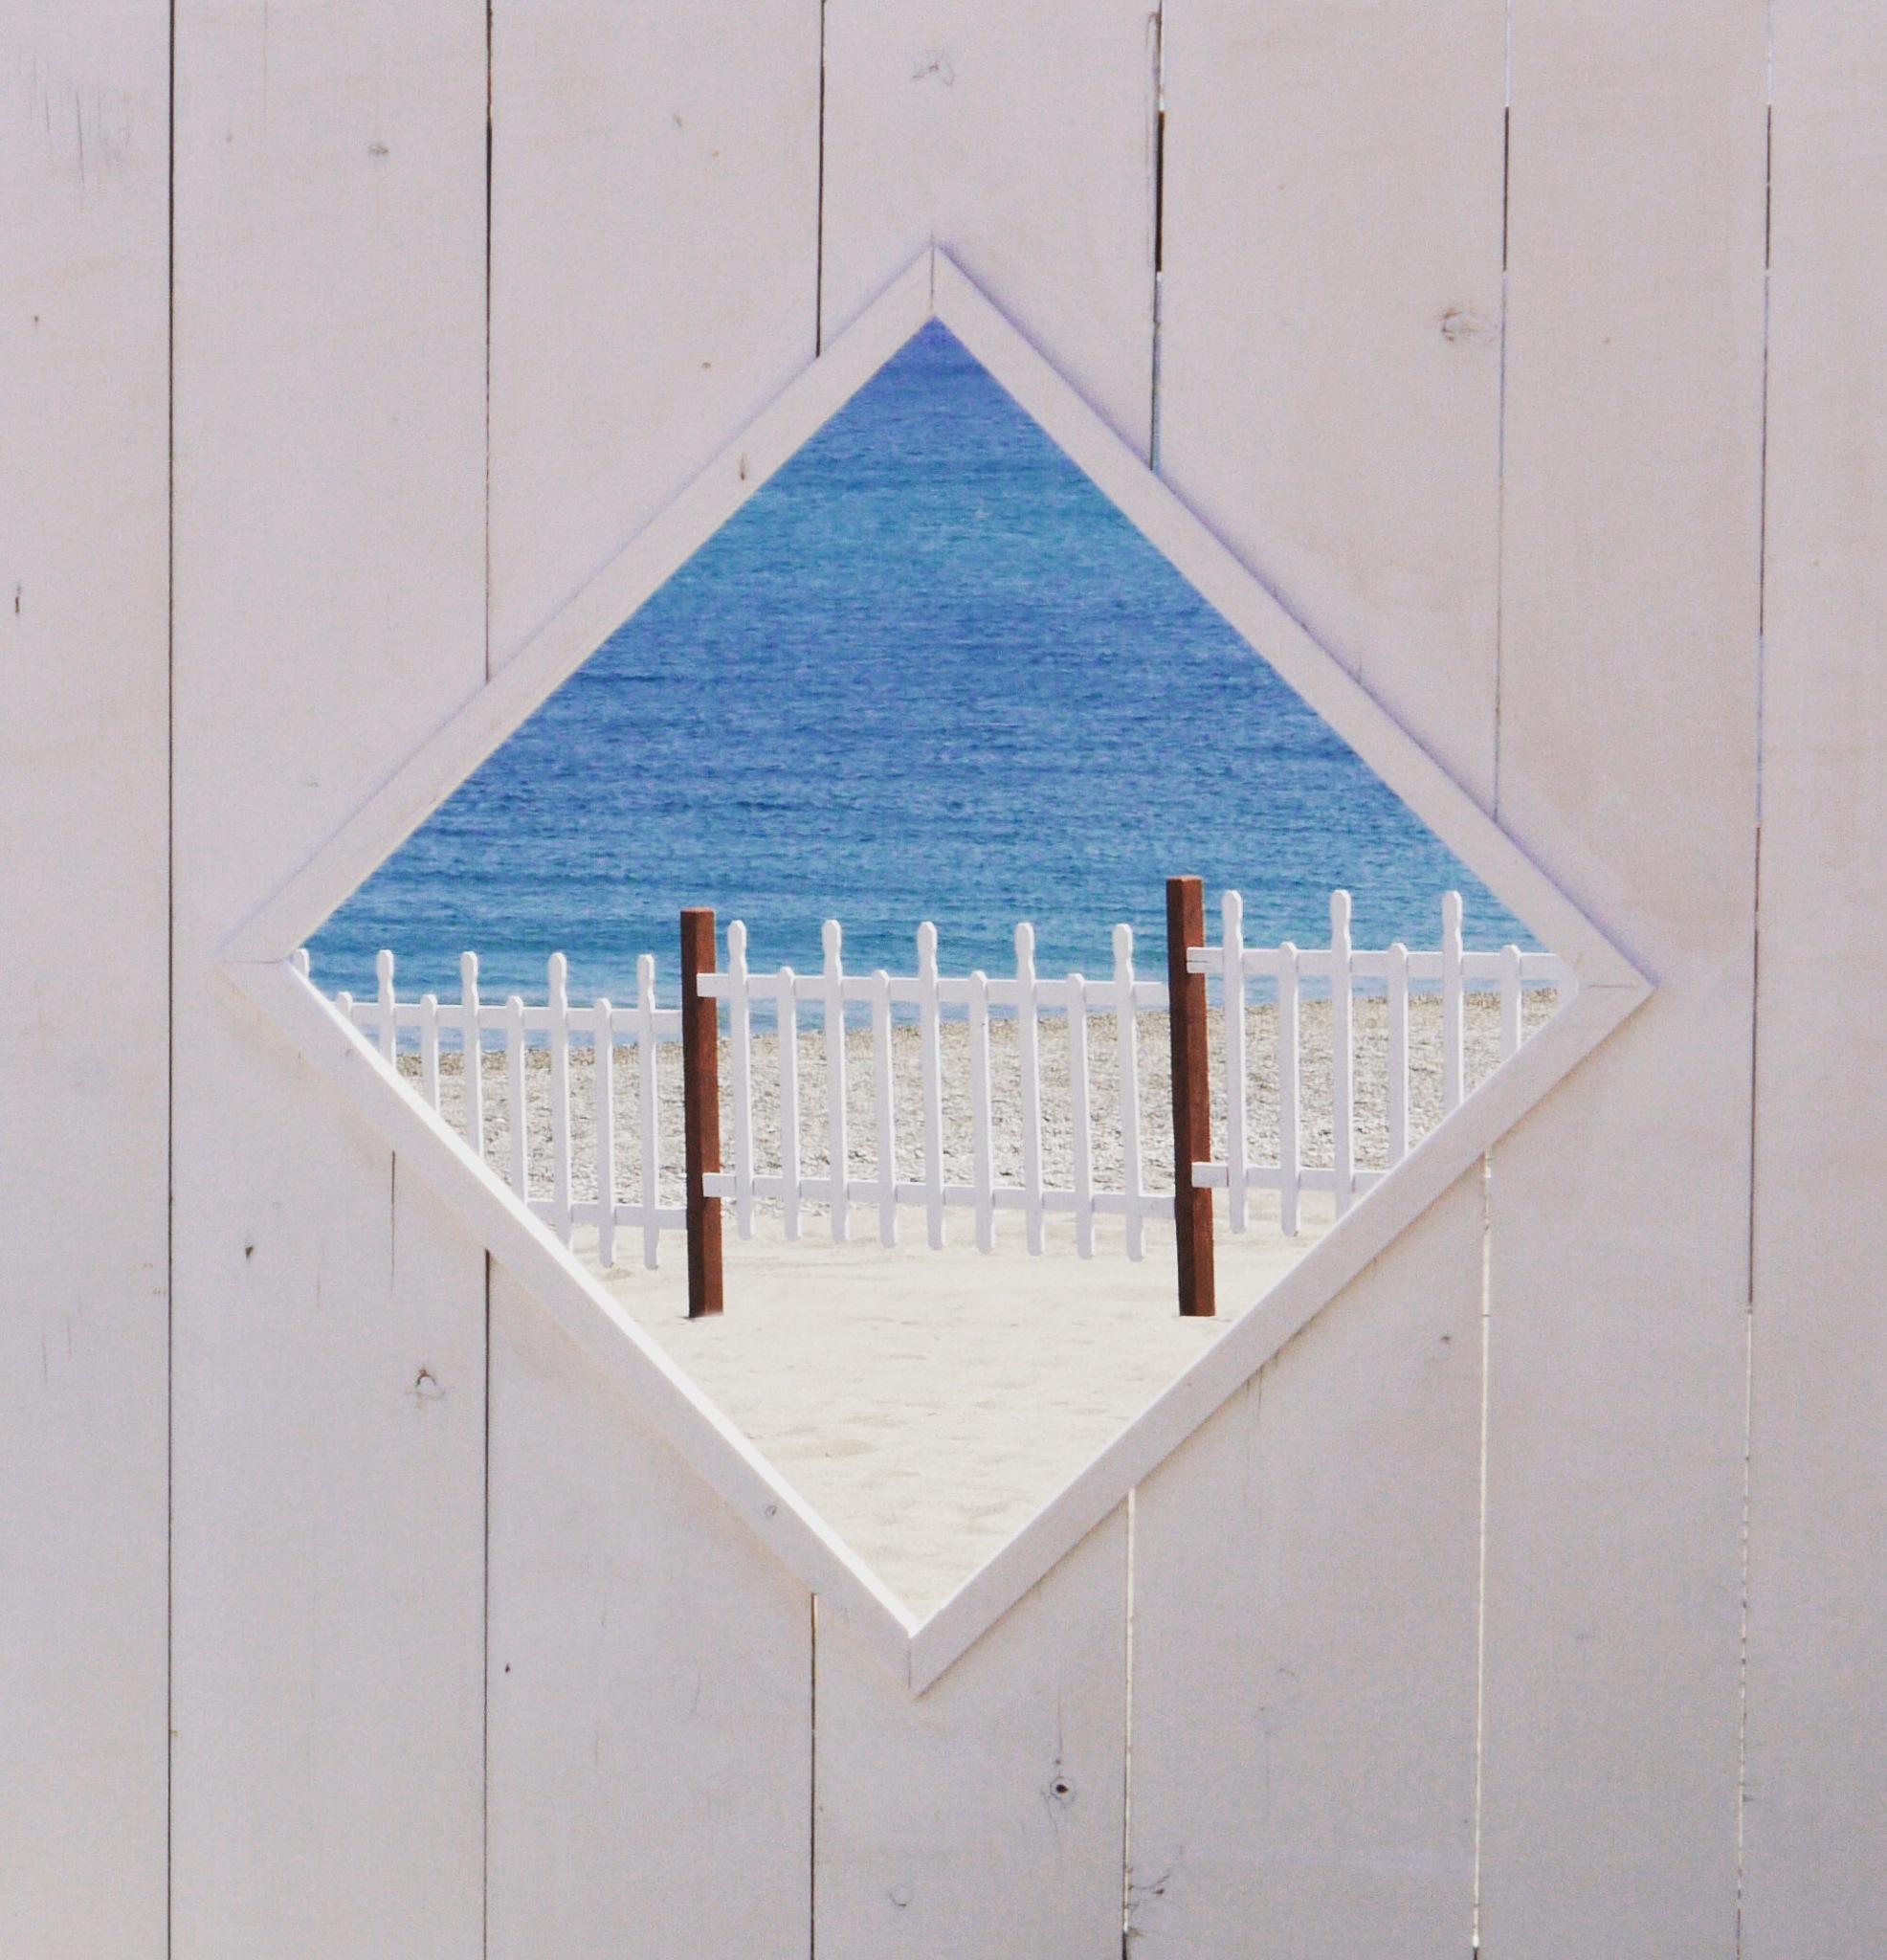 Beach time 2 by Gianfranco Meano